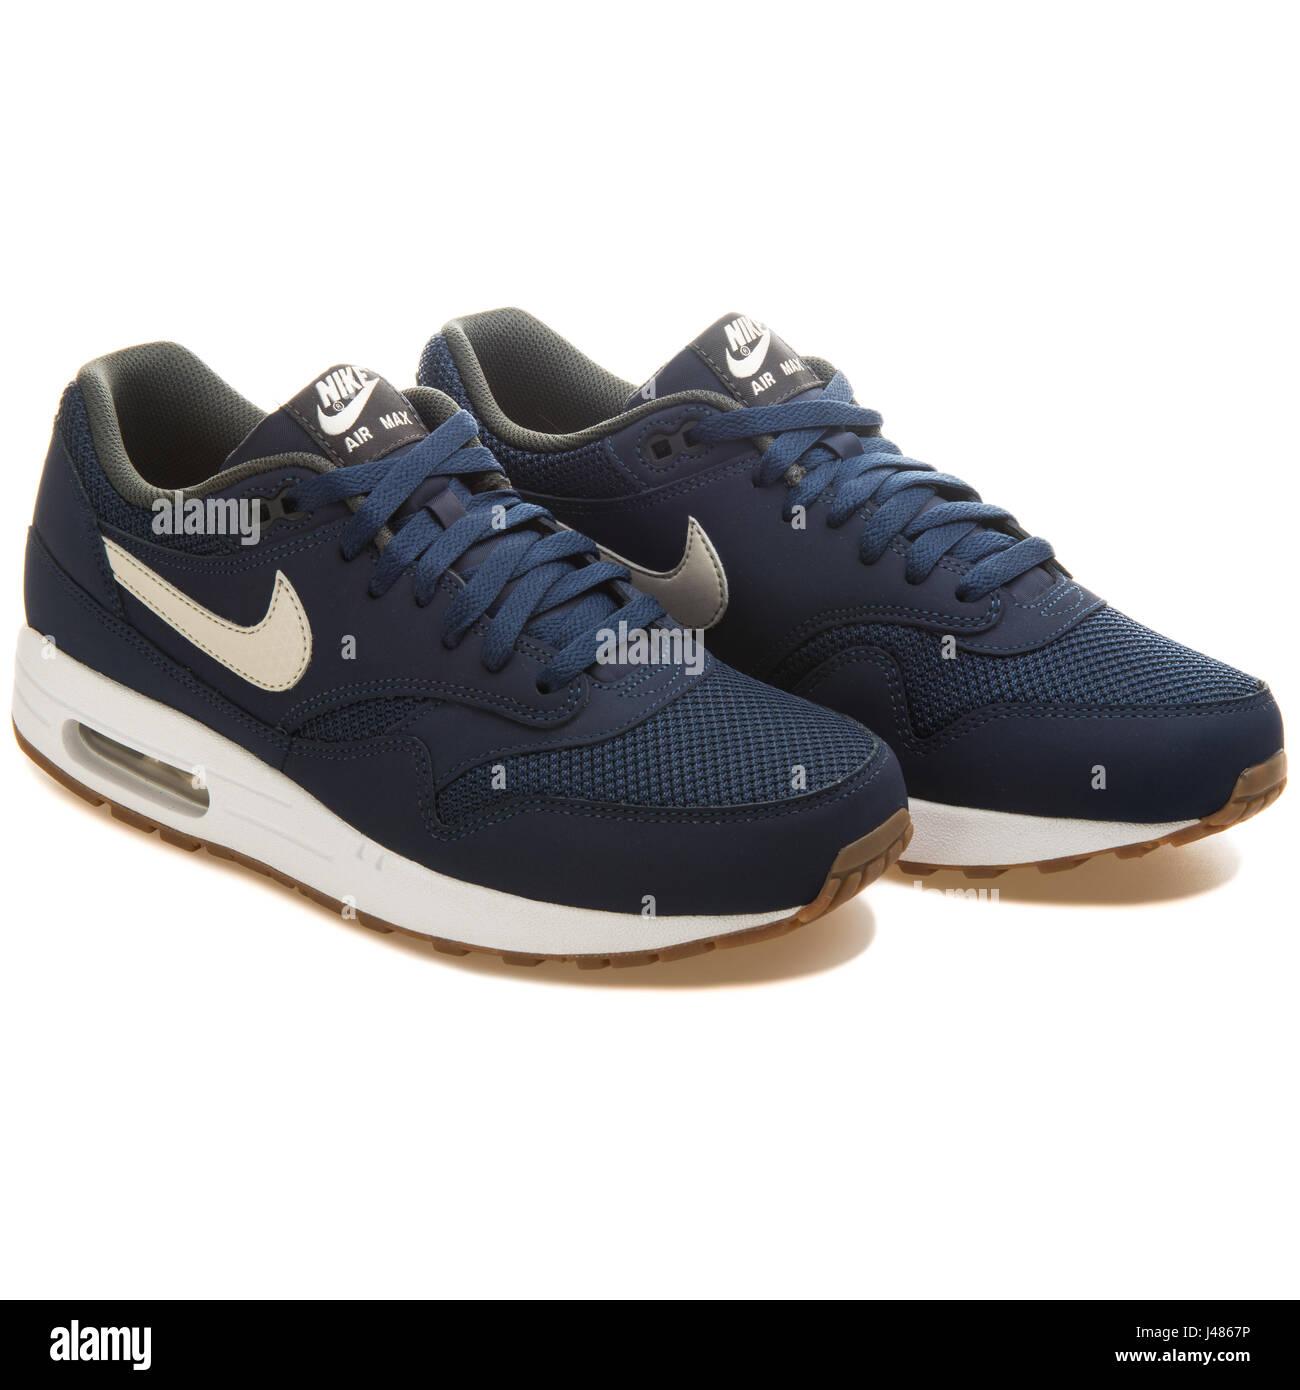 premium selection 59f36 3d931 Nike Air Max 1 Essential - 537383-401 - Stock Image